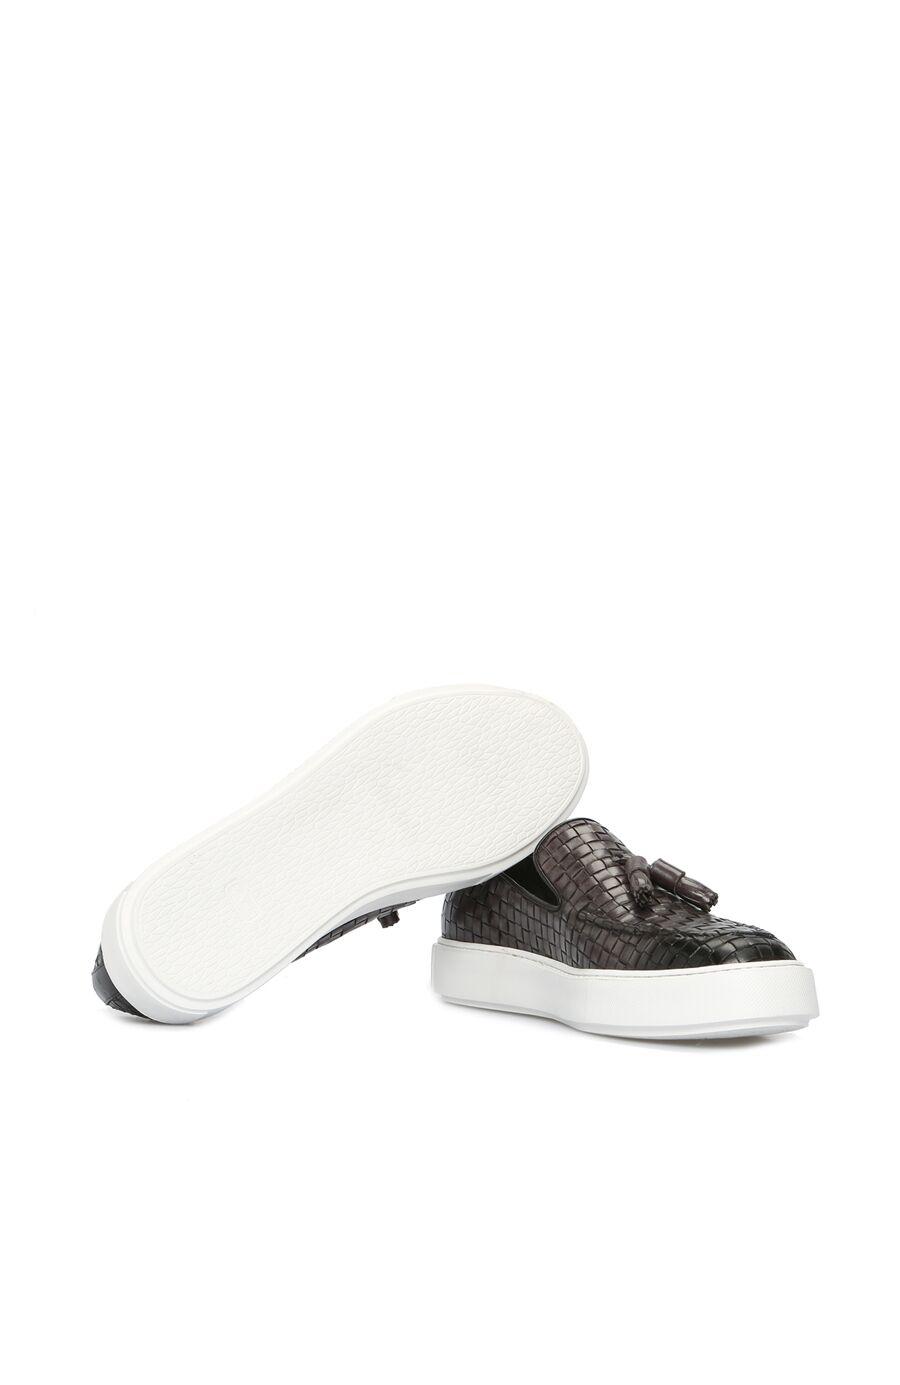 Örgü Antrasit Loafer